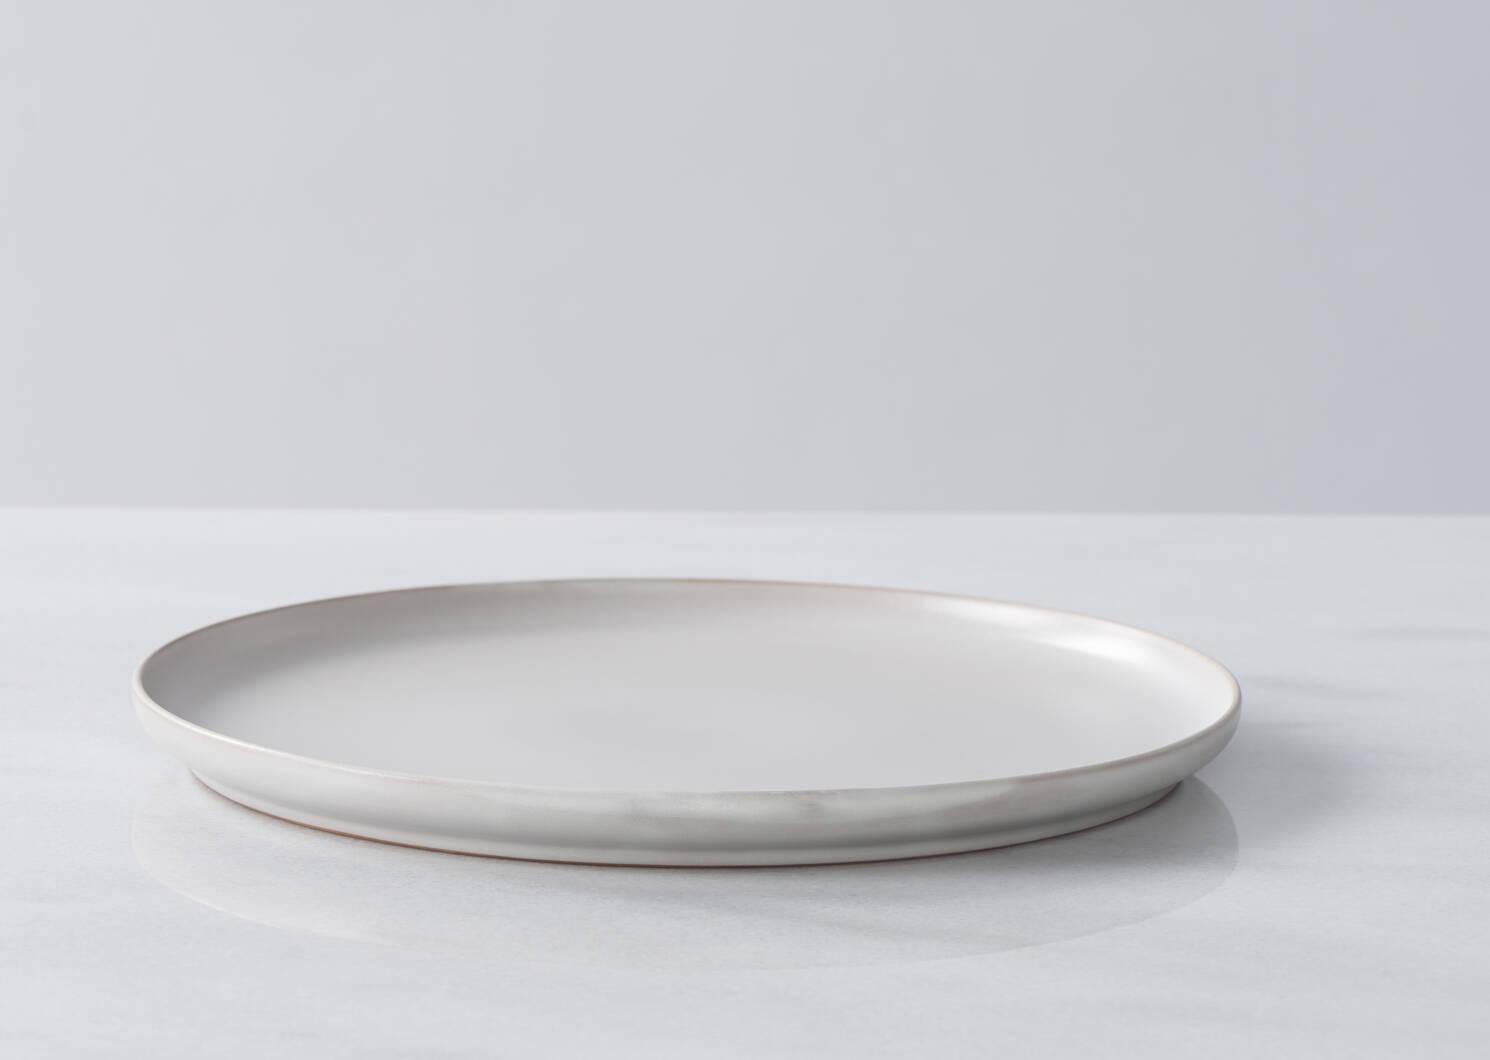 Mayne 16 pc Dish Set Light Grey